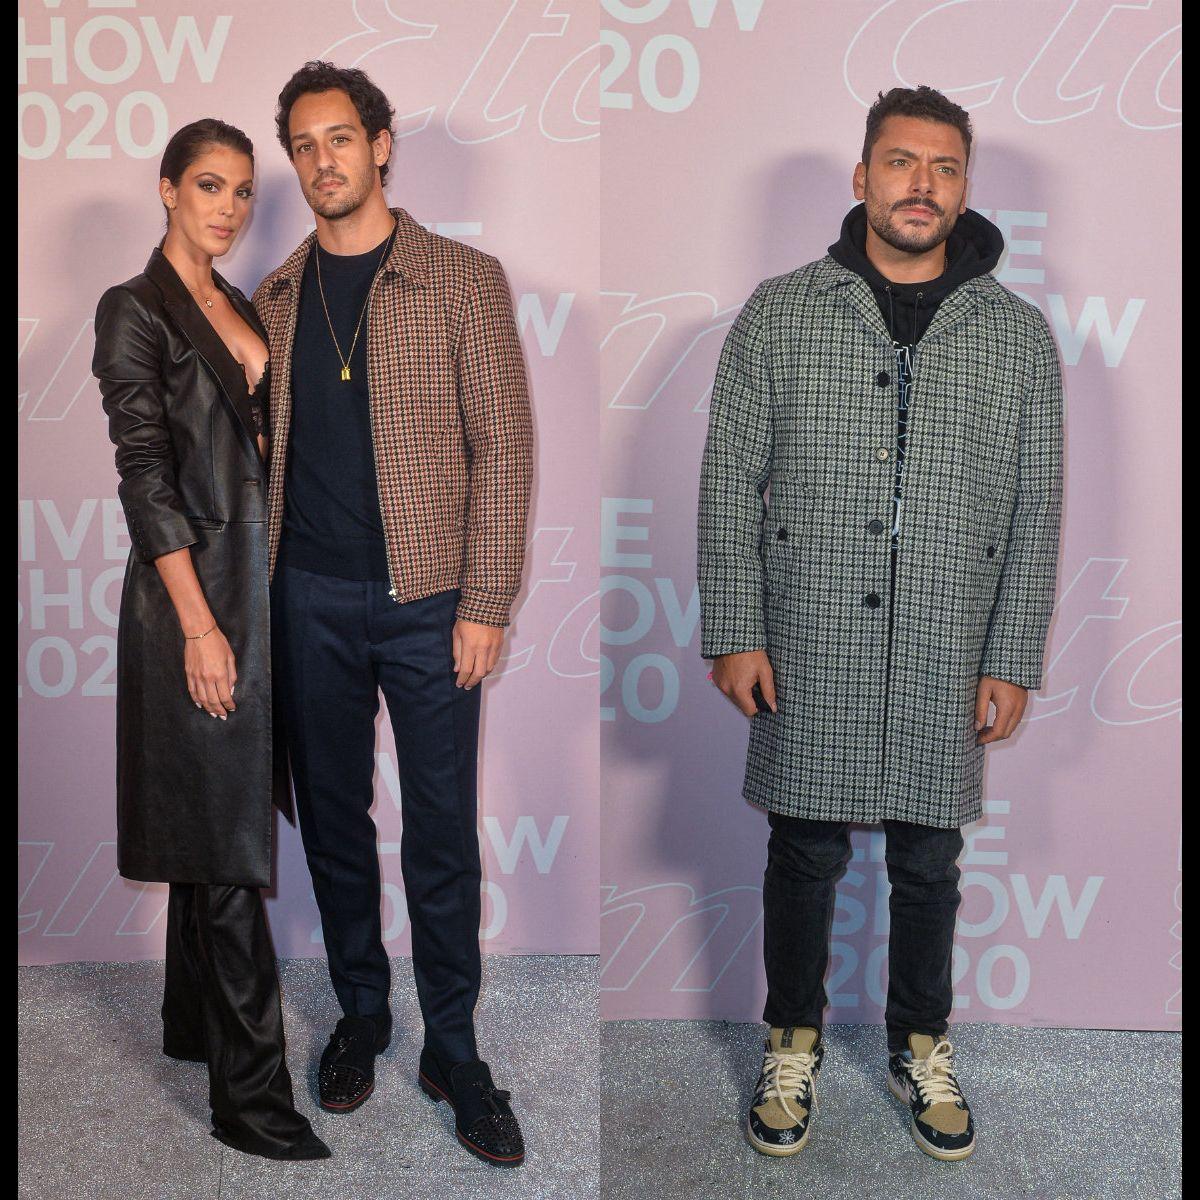 Iris Mittenaere Retrouvailles Tres Sexy Avec Kev Adams Face A Son Boyfriend Diego Purepeople